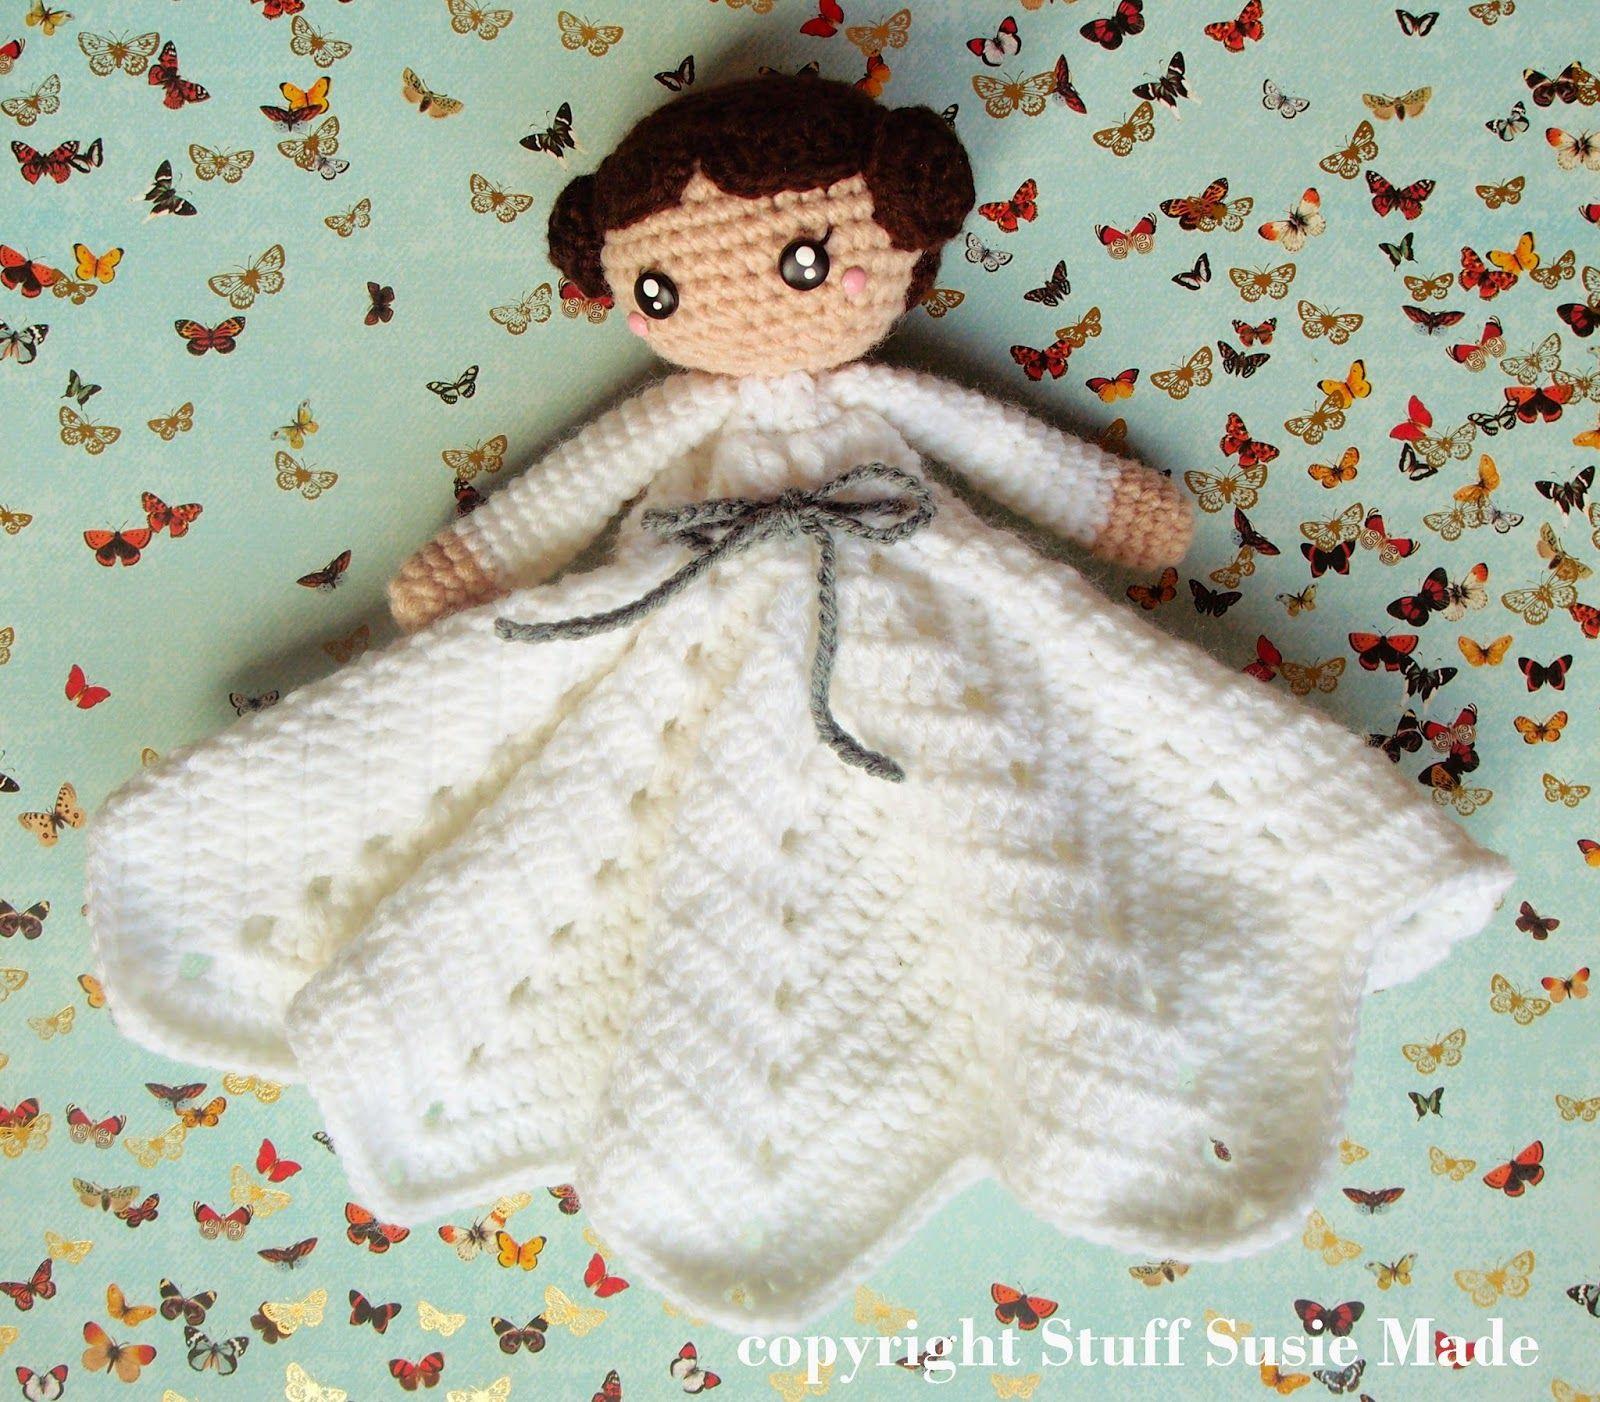 Httpstuffsusiemadespot201501princess leia blankie princess leia blankie free crochet pattern and tutorial free pattern bankloansurffo Images